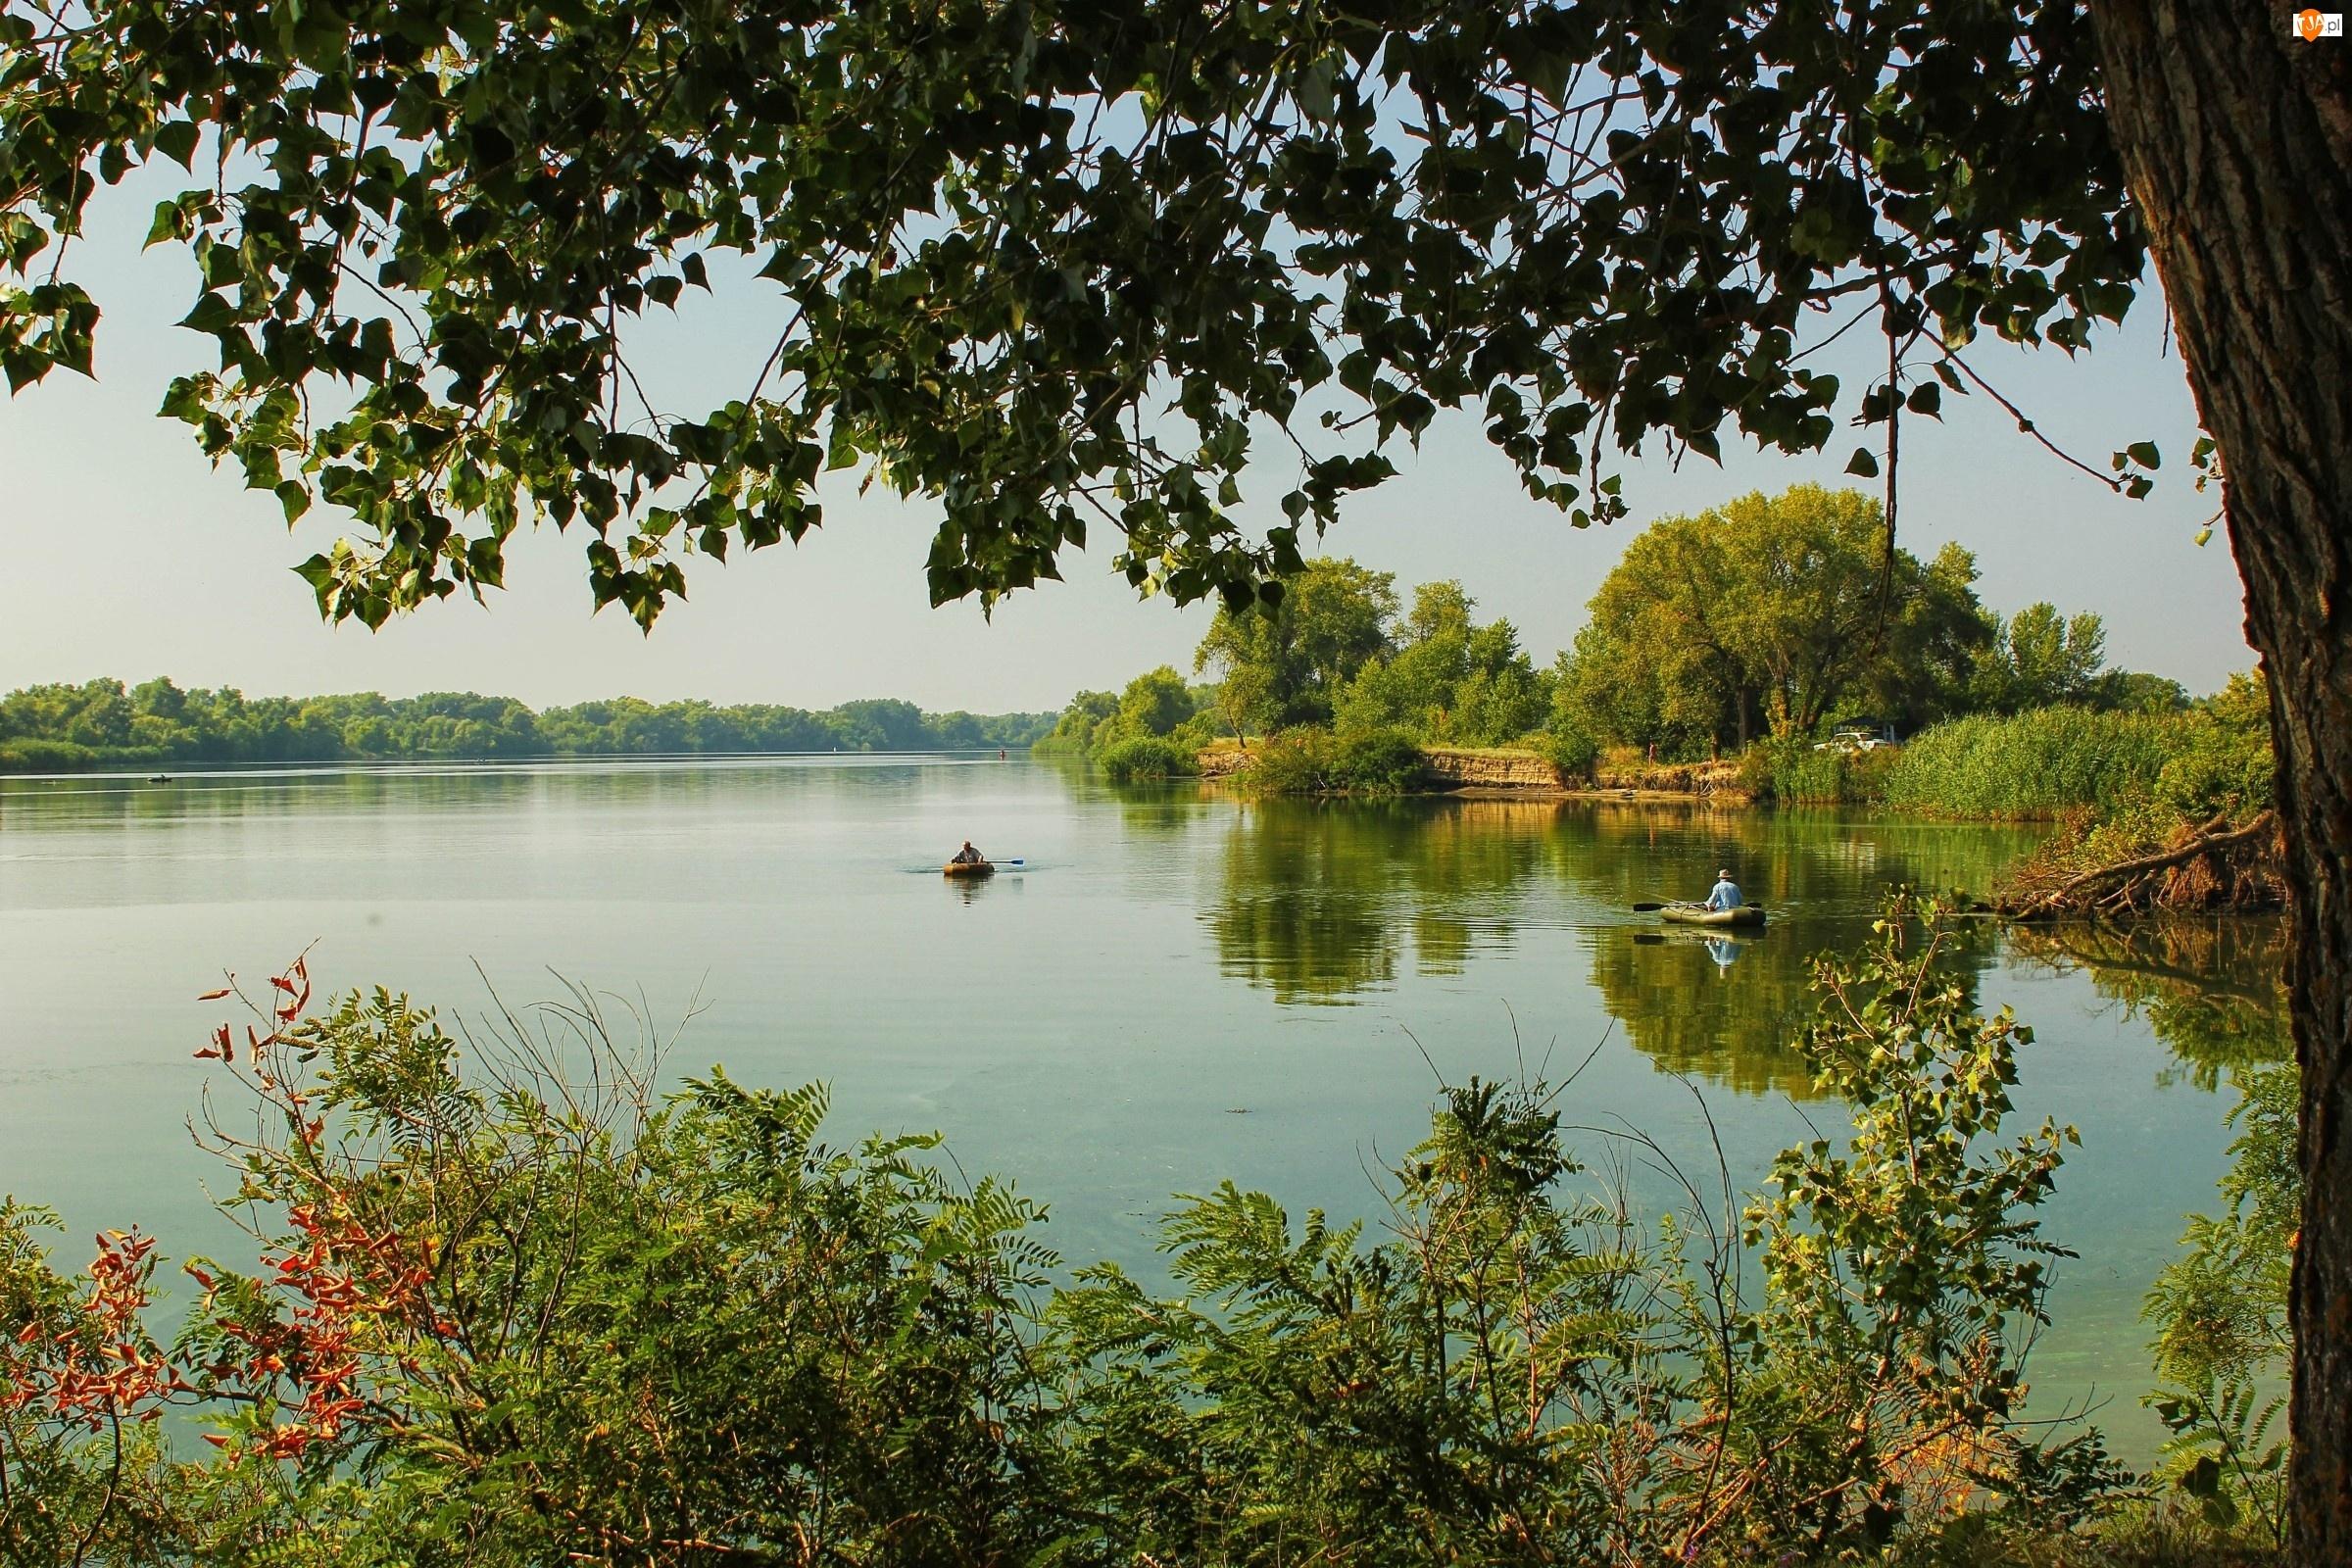 Rzeka, Lato, Wędkarze, Lasy